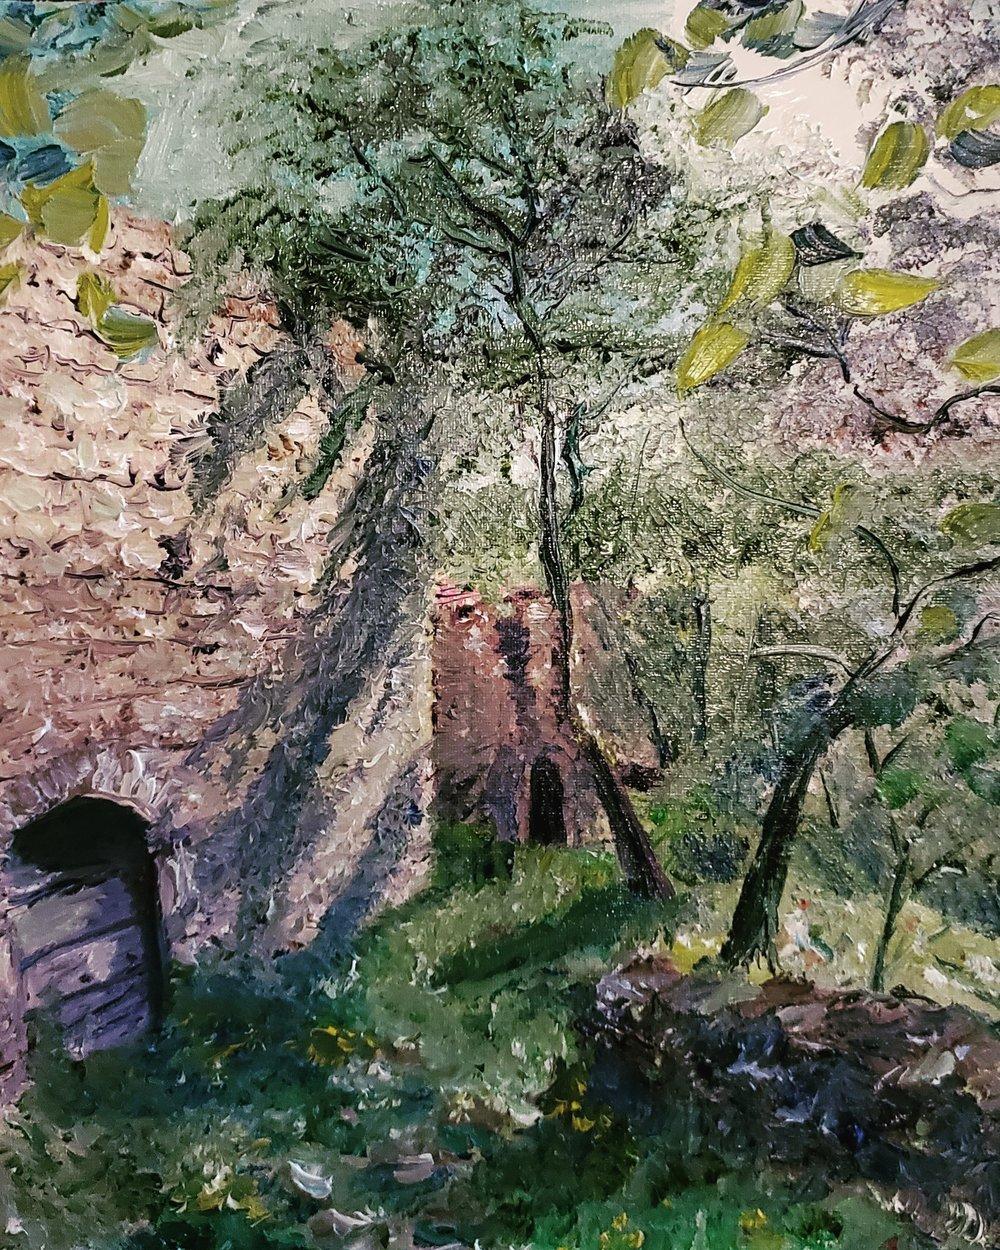 OldTellaro, Liguria, Italy; oil on canvas; 2019